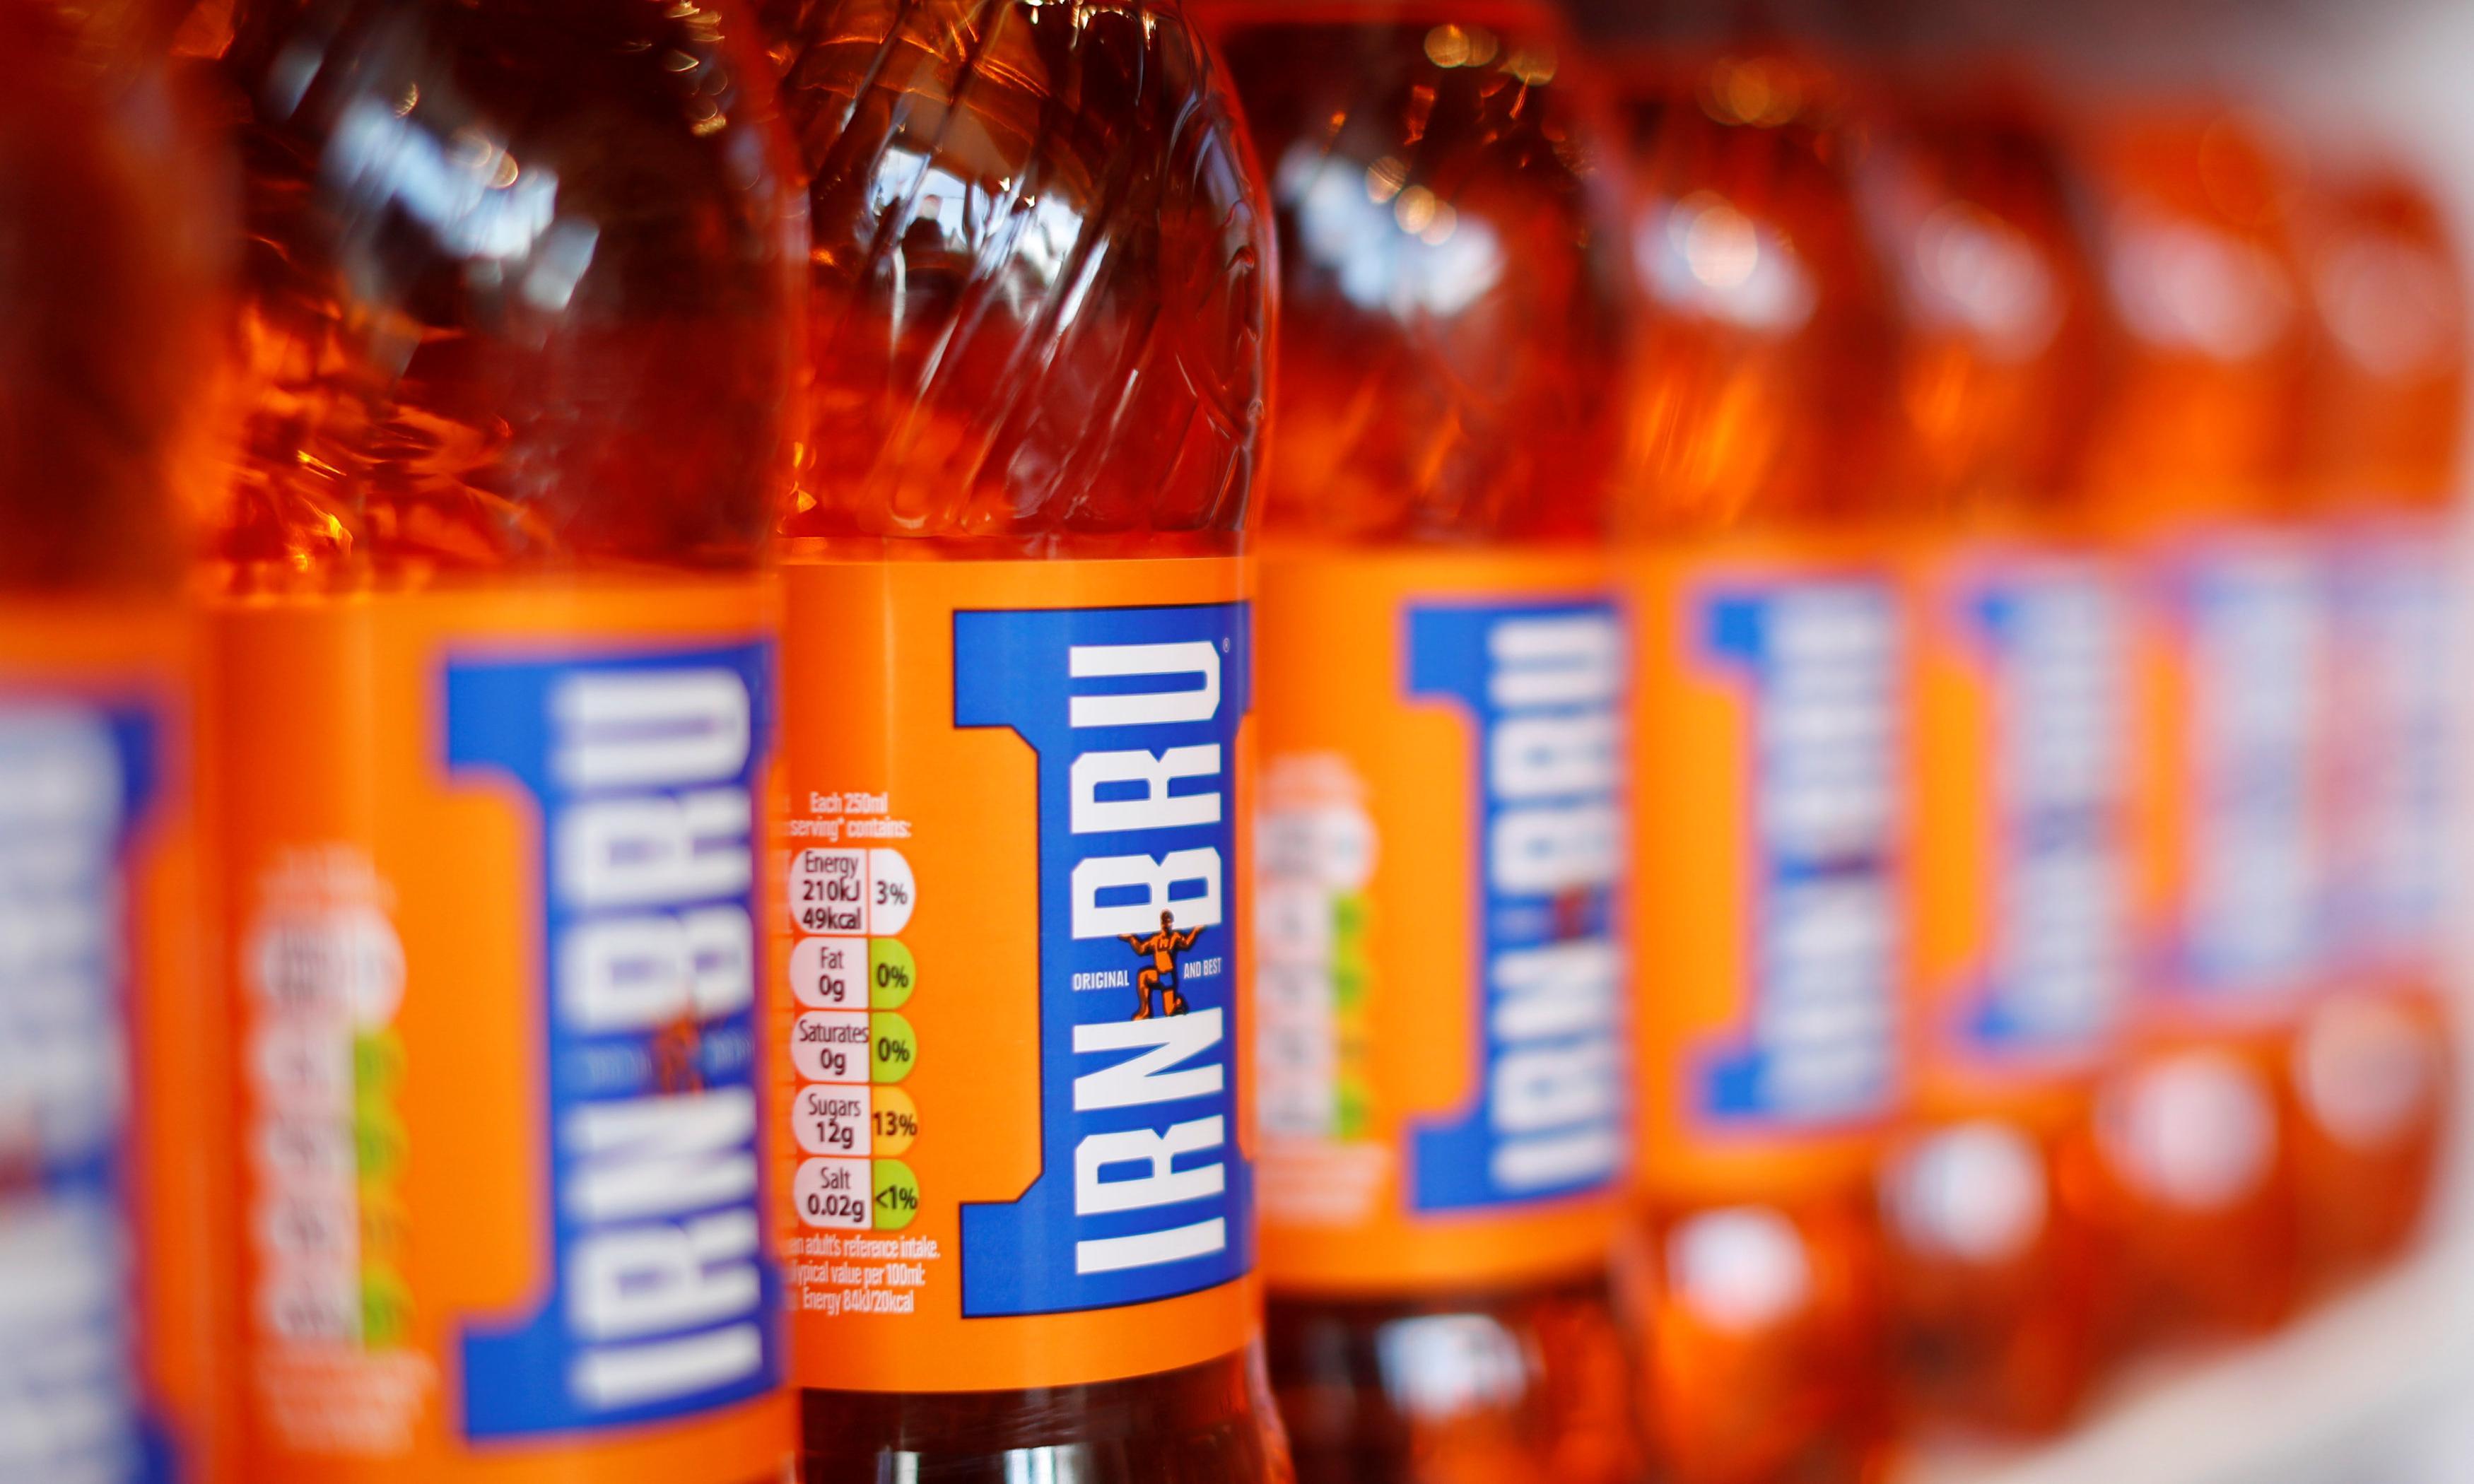 Irn-Bru maker warns over profits after bad weather and sugar tax